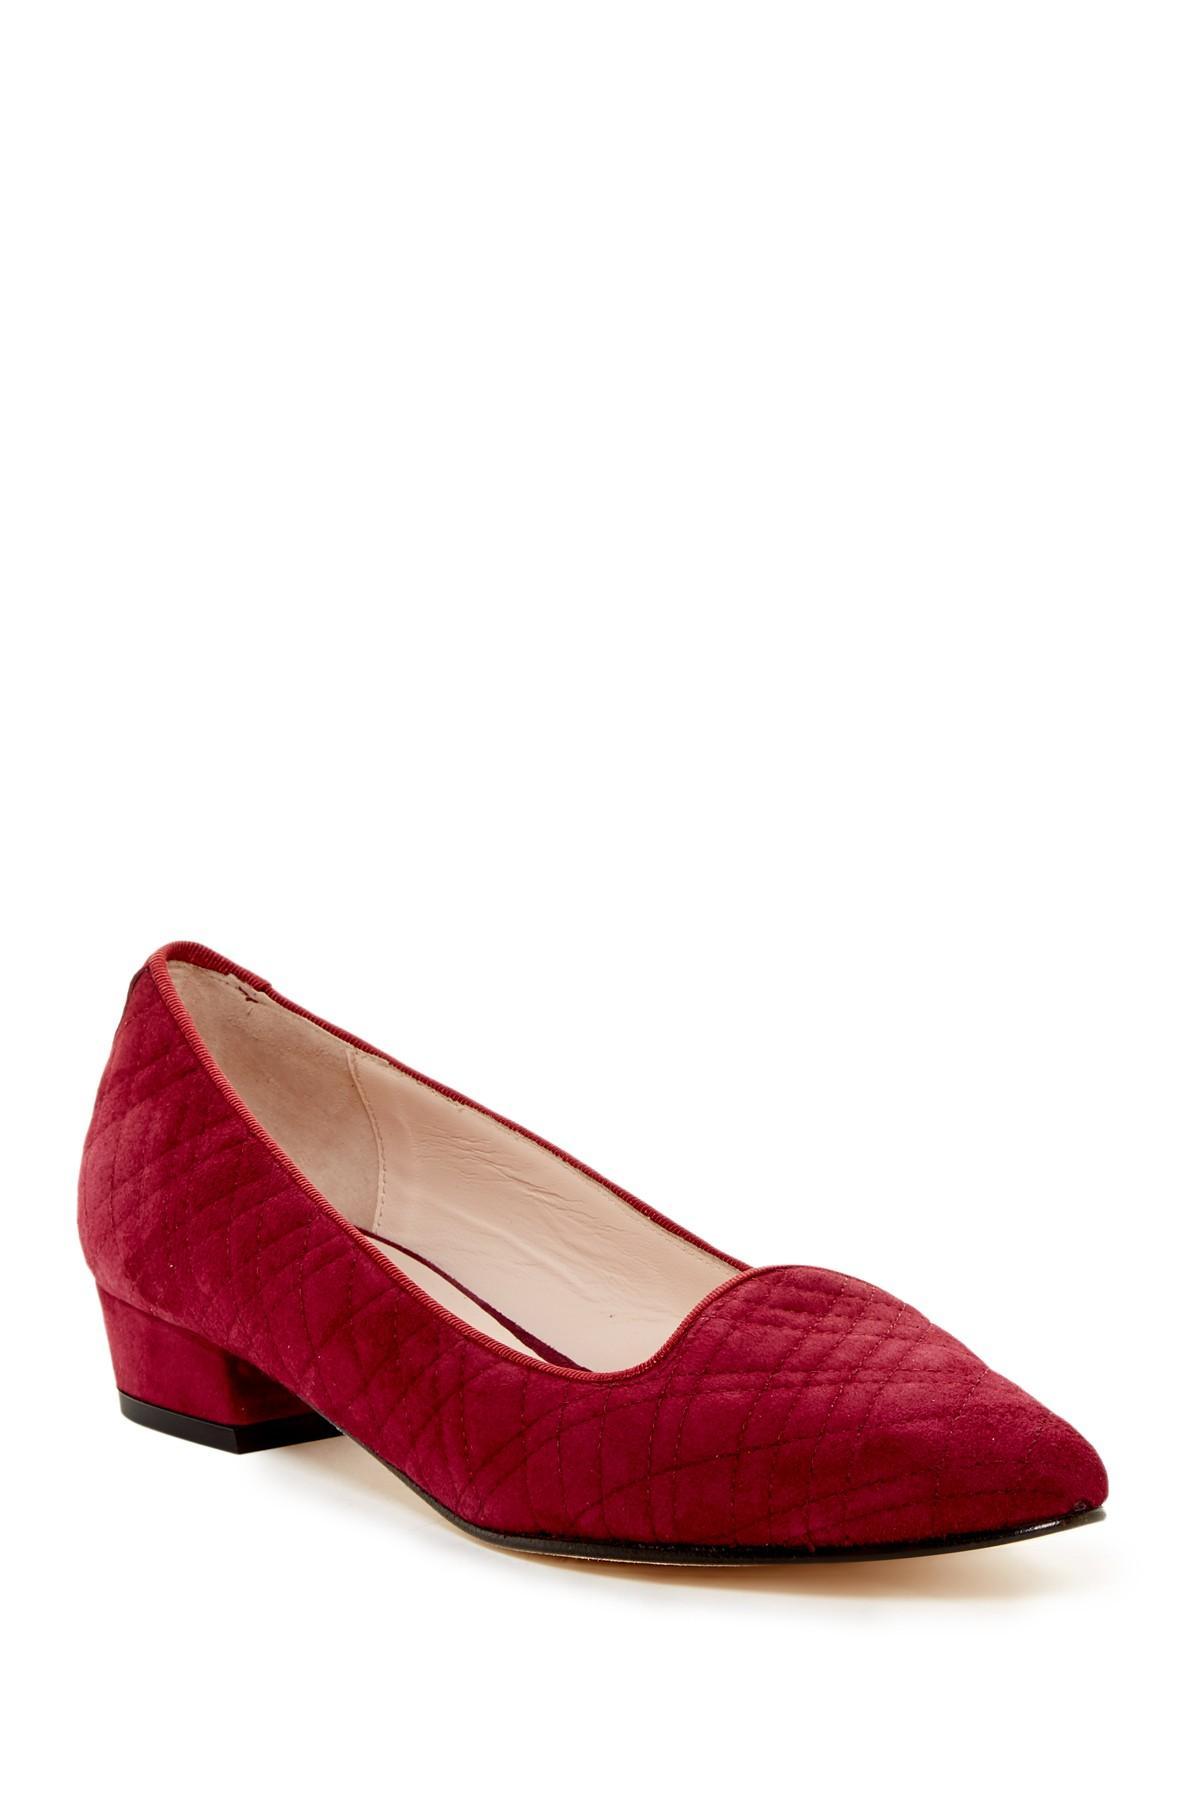 Metal Shoes Women Lux